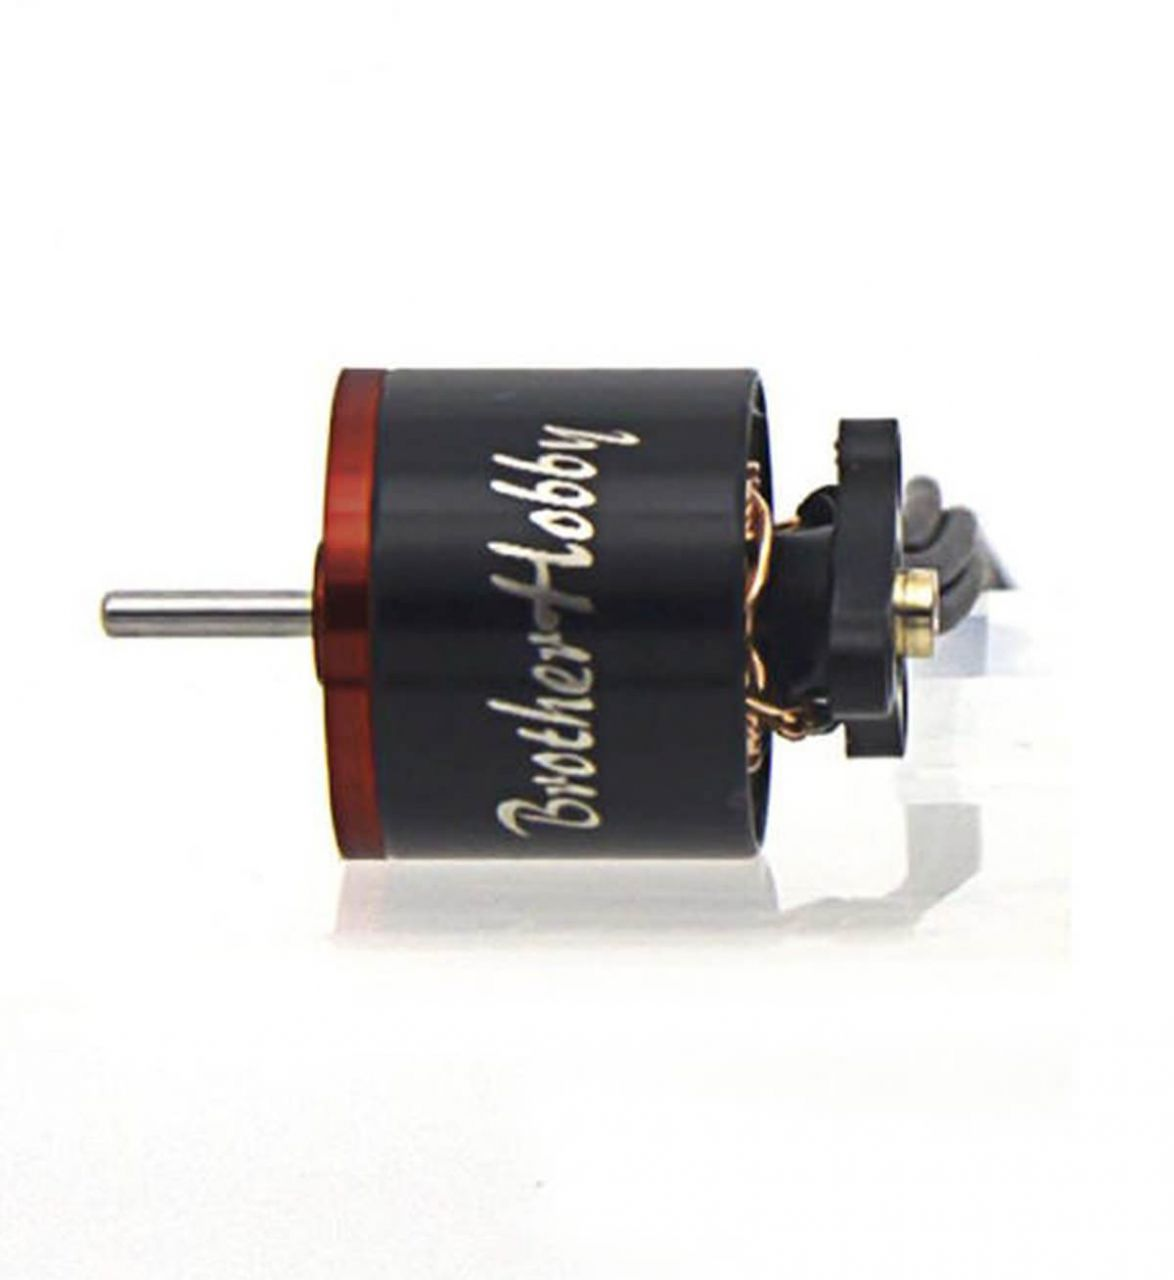 Brotherhobby 0706 15000kv Micro FPV Racing Brushless Motor 1S-2S 3g